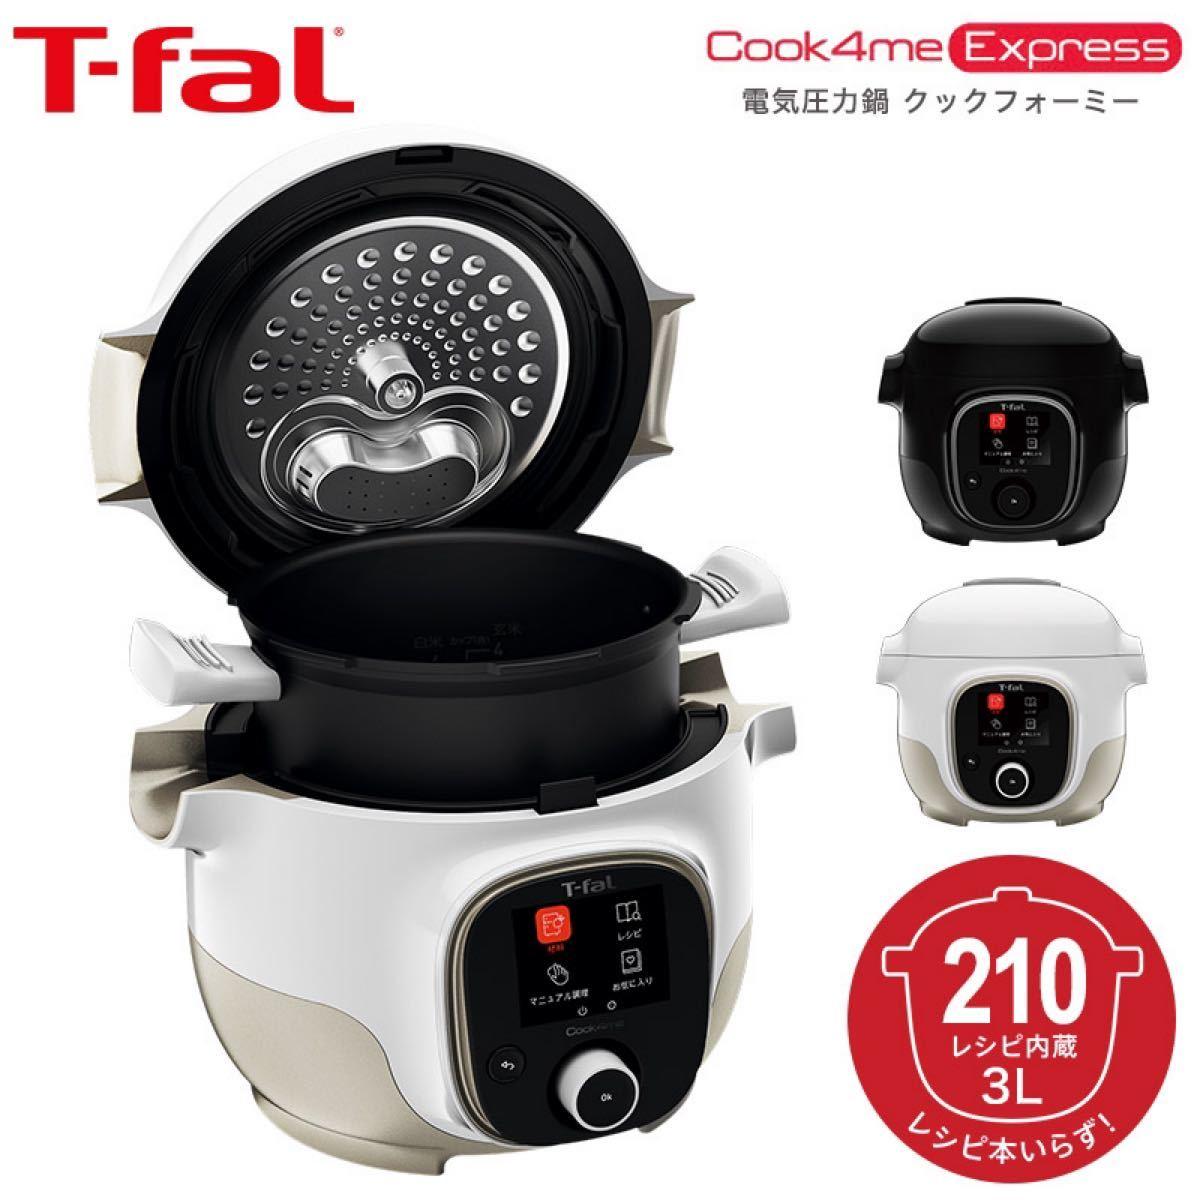 T-fal CY8708JP ブラック クックフォーミー [電気圧力鍋(3L)]